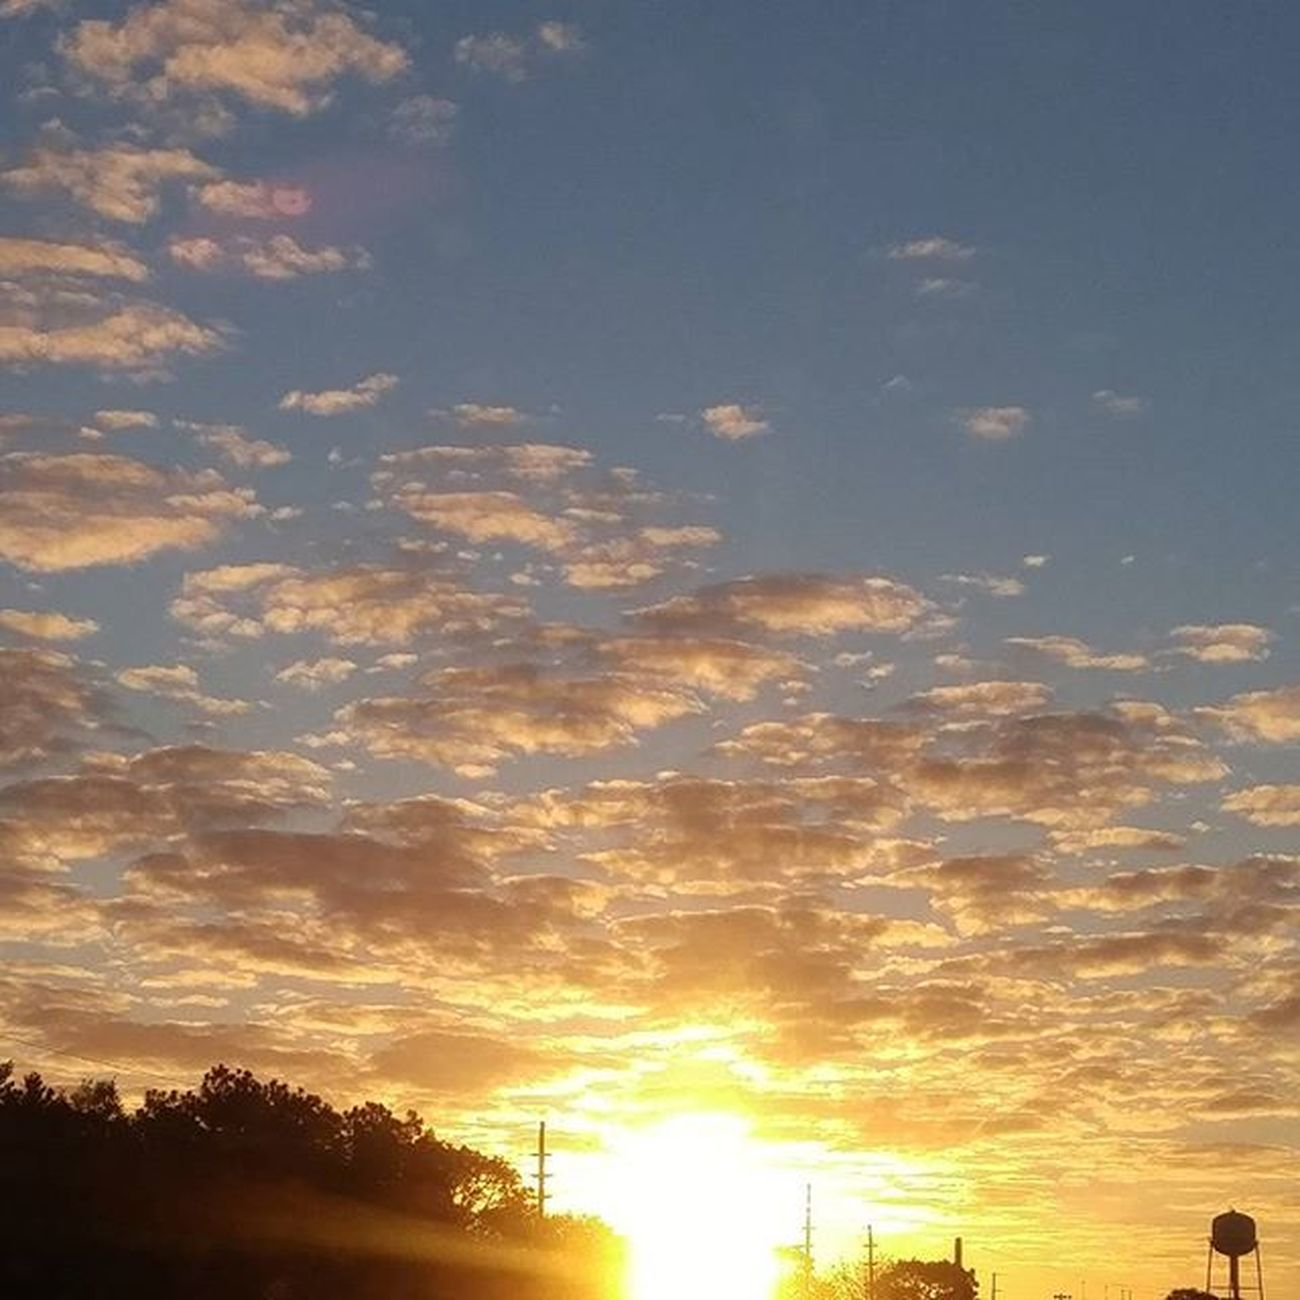 Good morning and happy Monday Sunrise LoveFl Emeraldcoast Emeraldcoasting Eglinafb Lgfanview LGG4 Lazerfocus @lggulf @lgusamobile @lgus @lgmobileglobal @LGUSAMobile @sharealittlesunshine @pureflorida